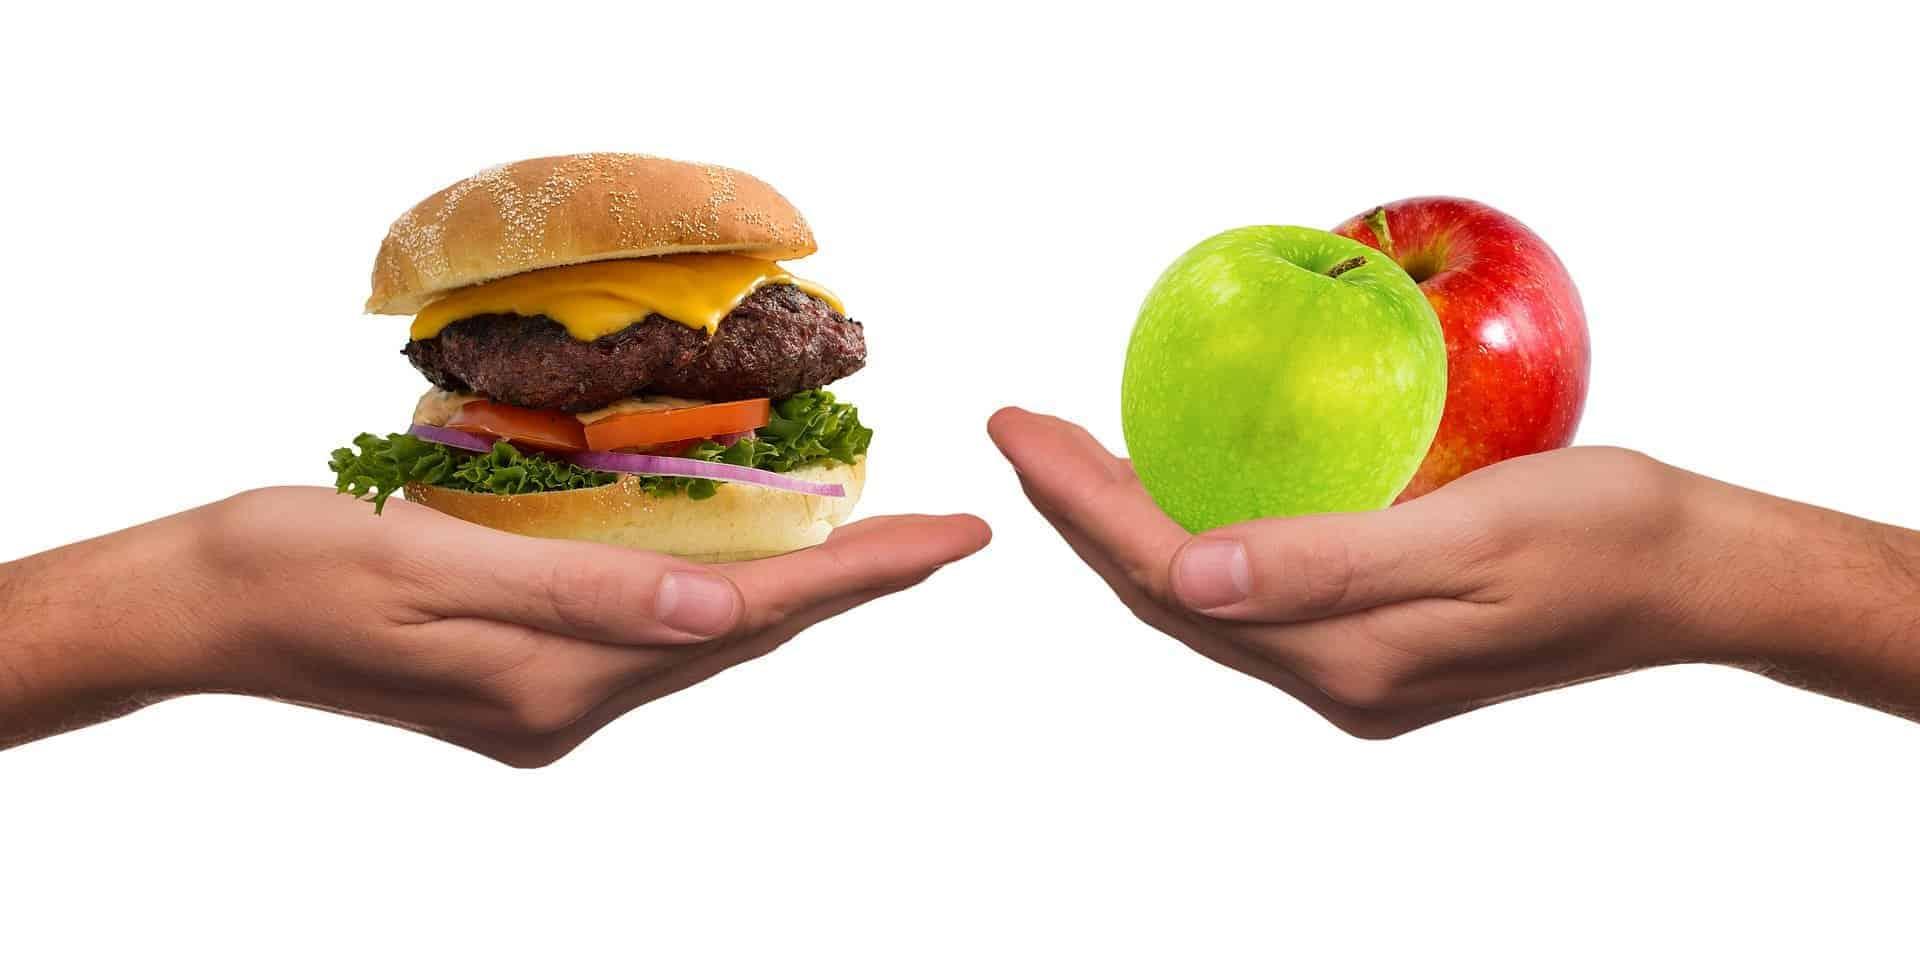 Burger vs an apple